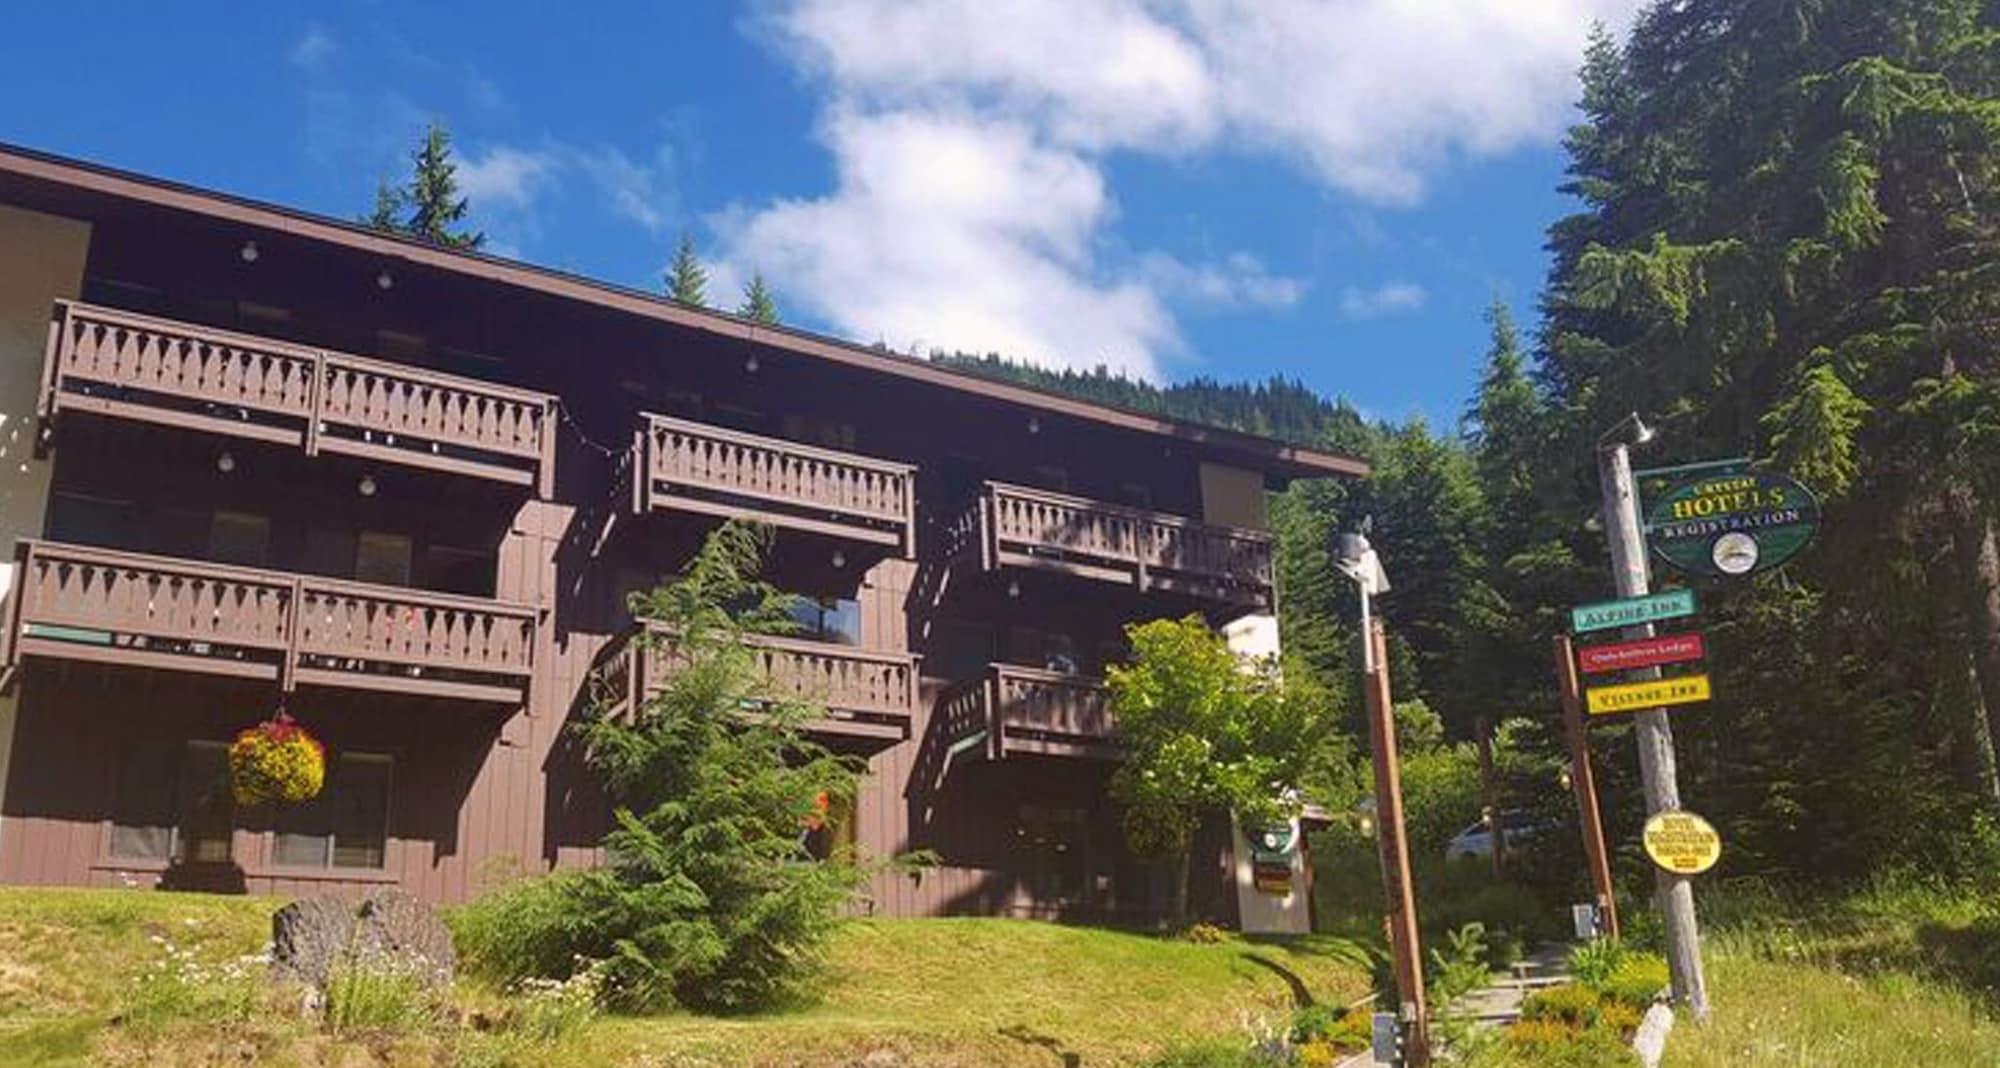 Crystal Mountain Hotels, Pierce